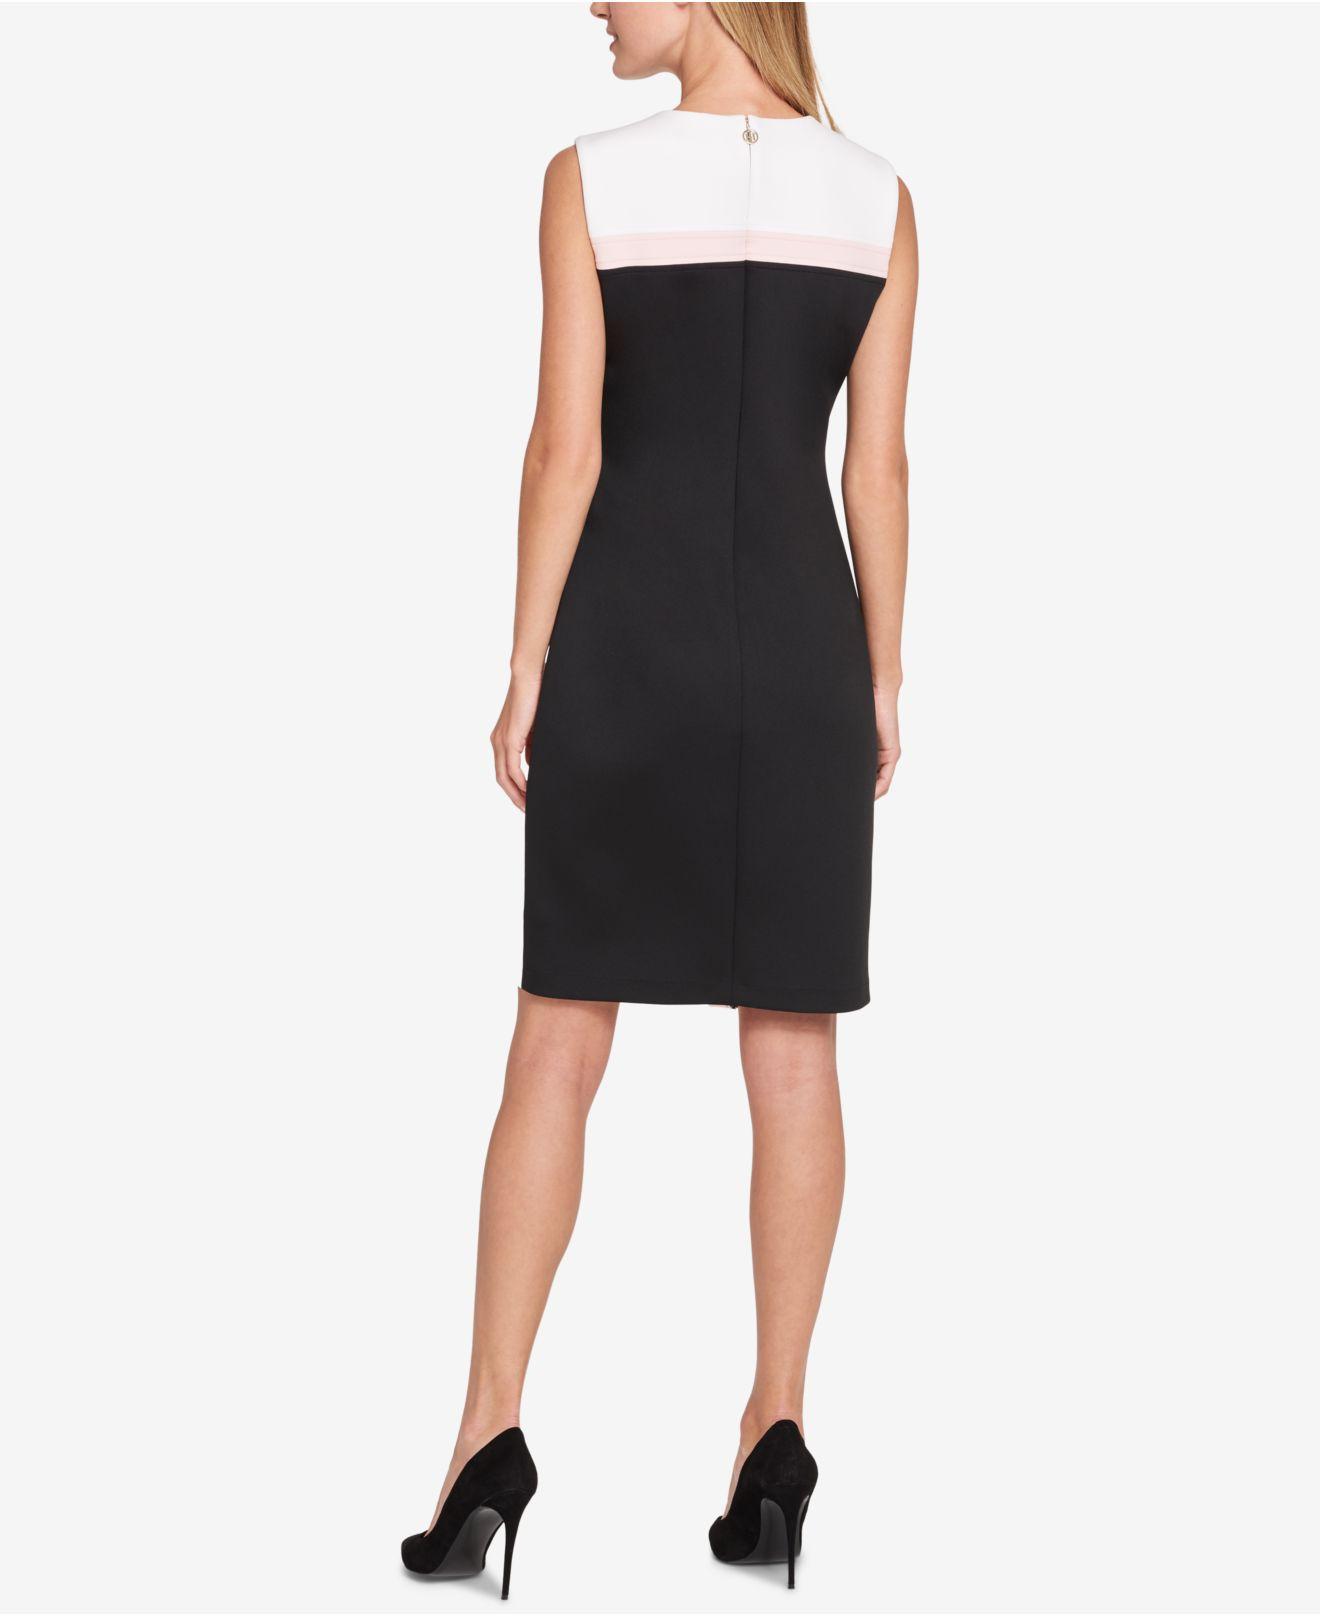 fa1b73801b5 Lyst - Tommy Hilfiger Petite Scuba Asymmetrical Hem Sheath Dress in Black -  Save 16%